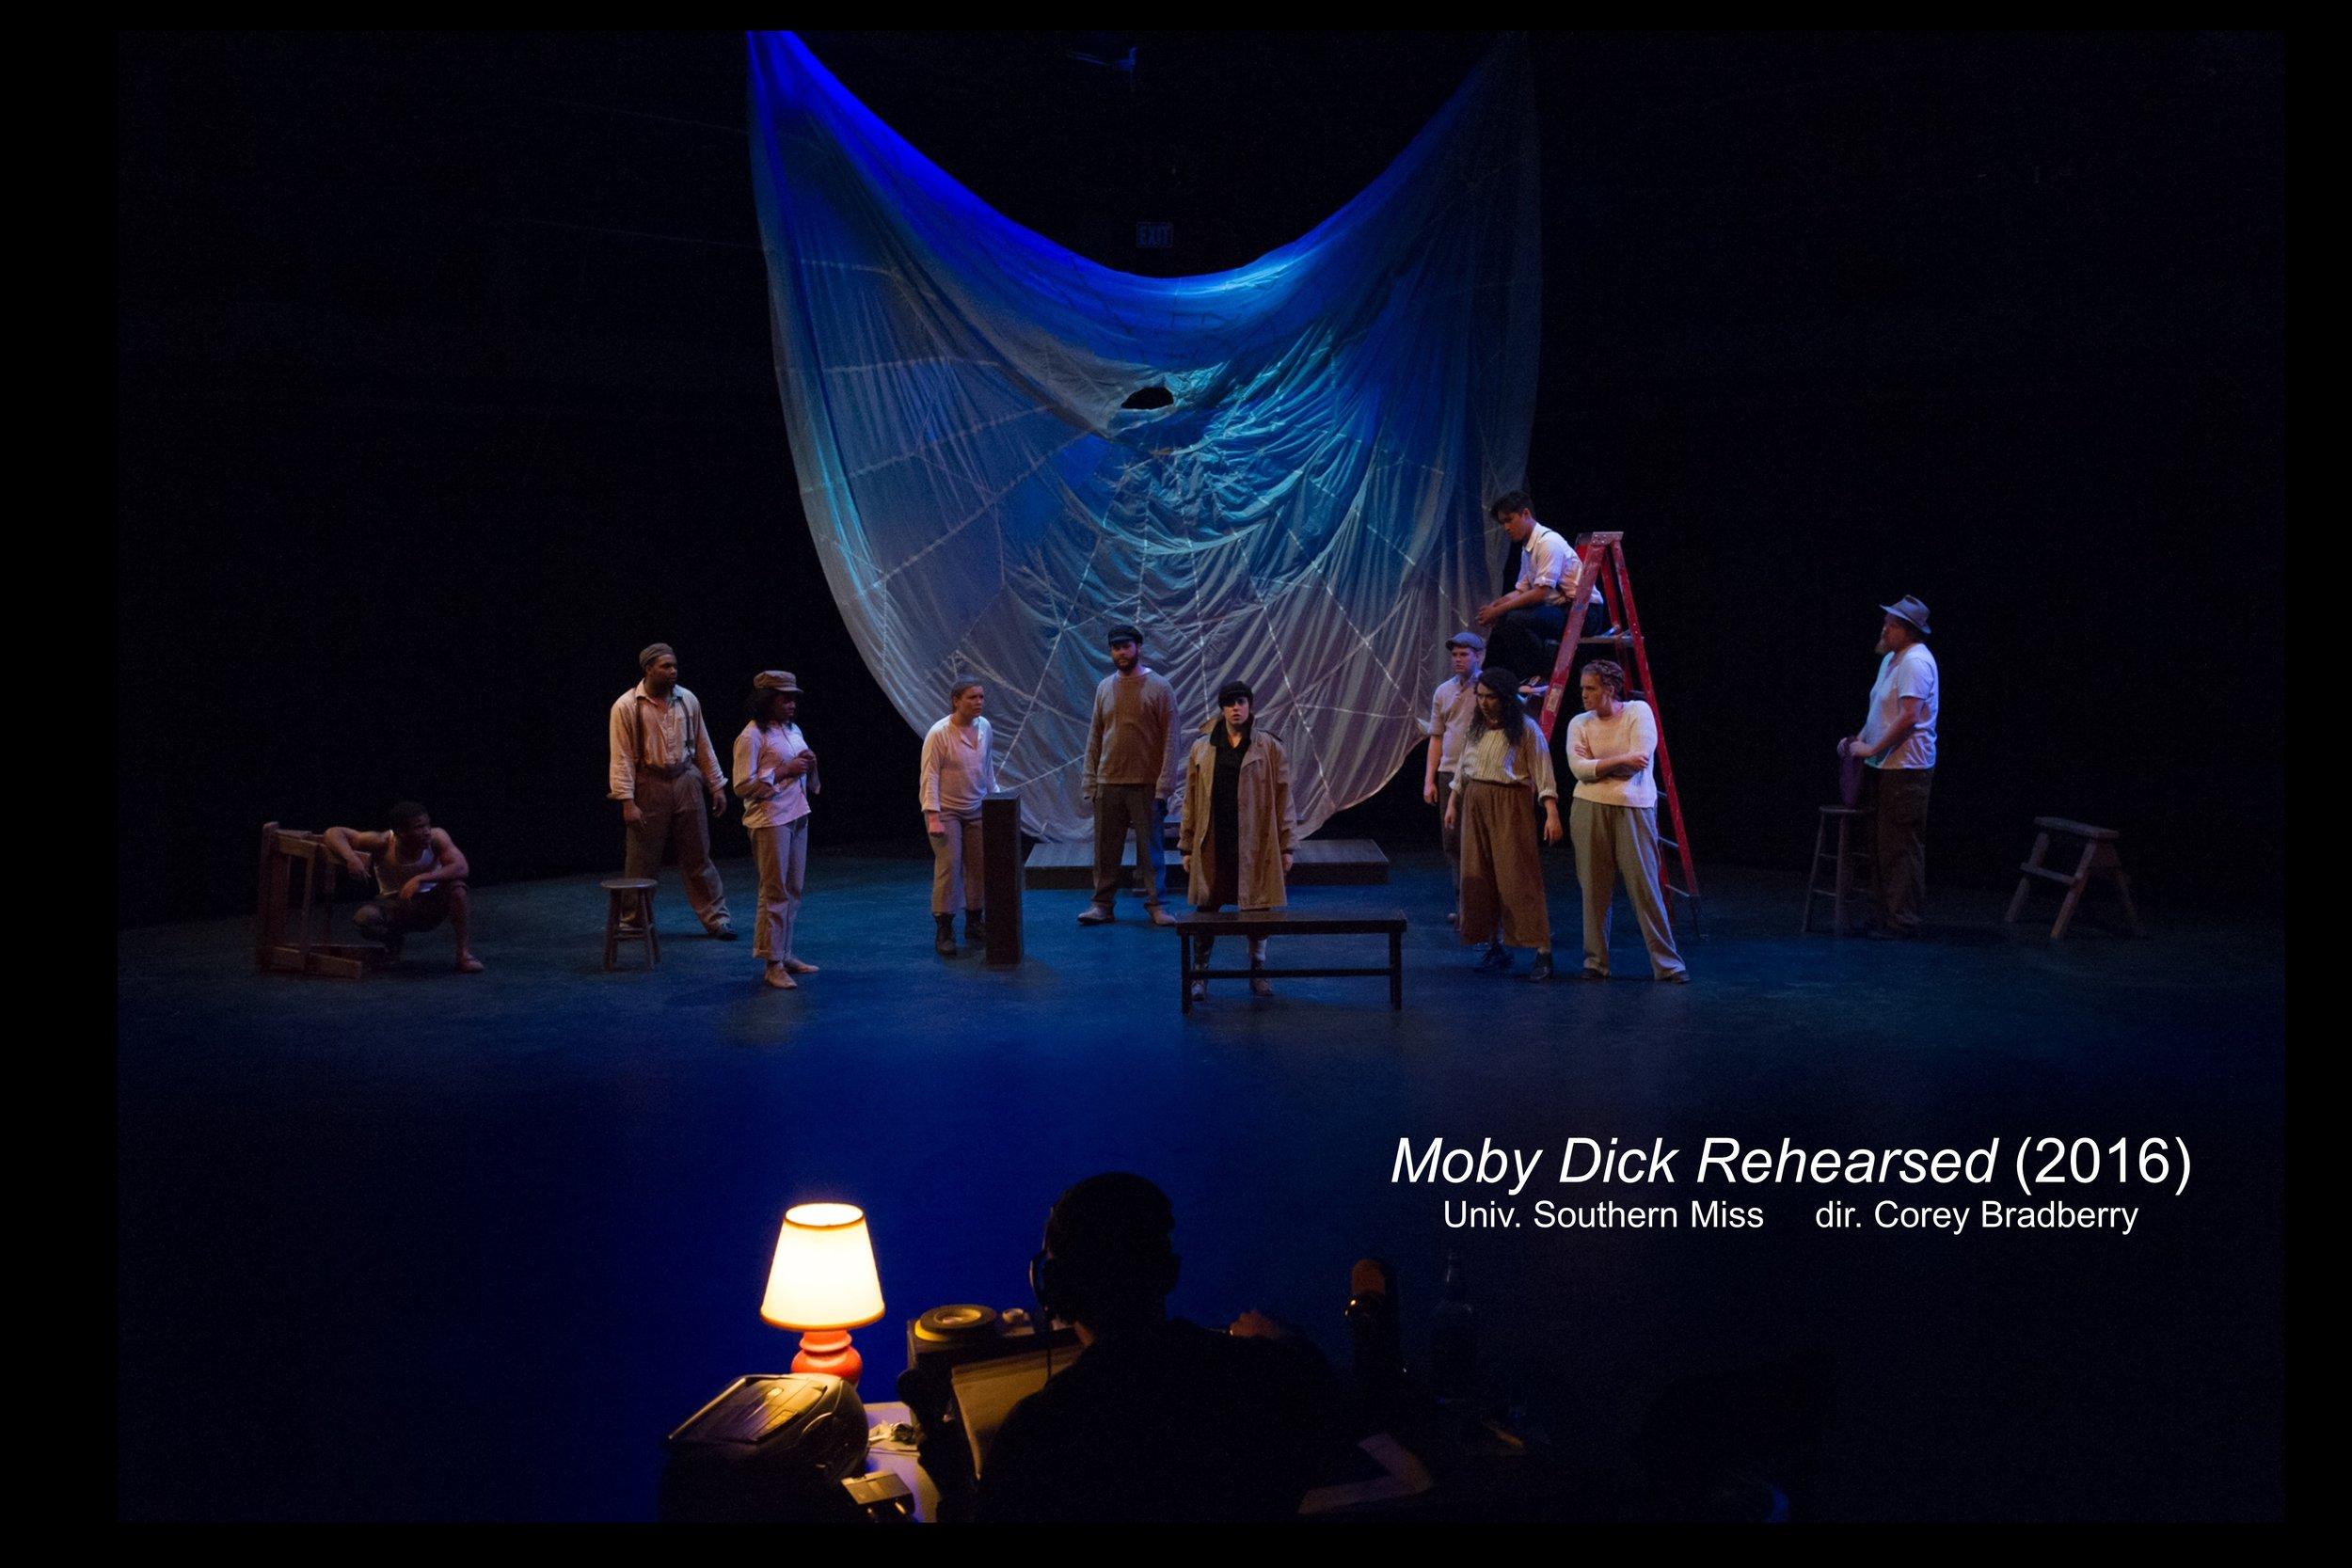 Moby Dick web 13.JPG